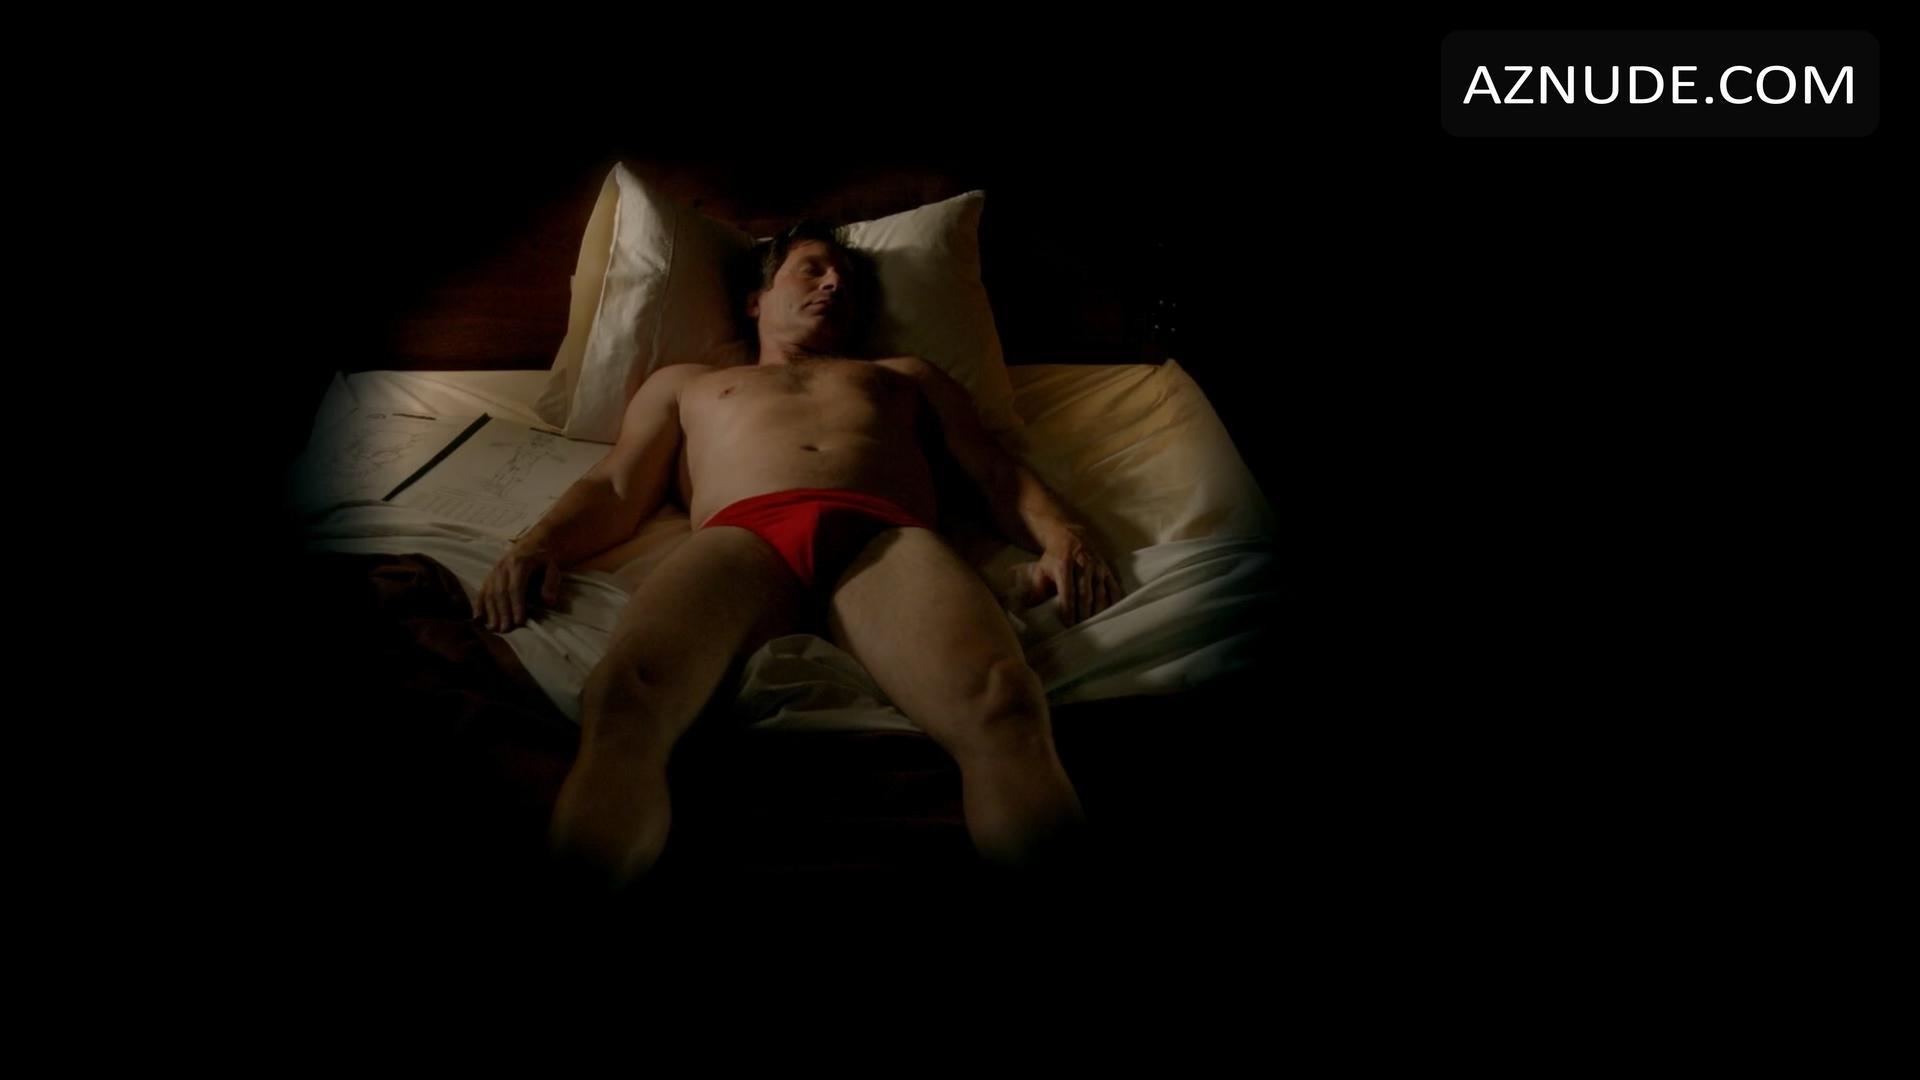 Hot David Duchovney Nude Pictures